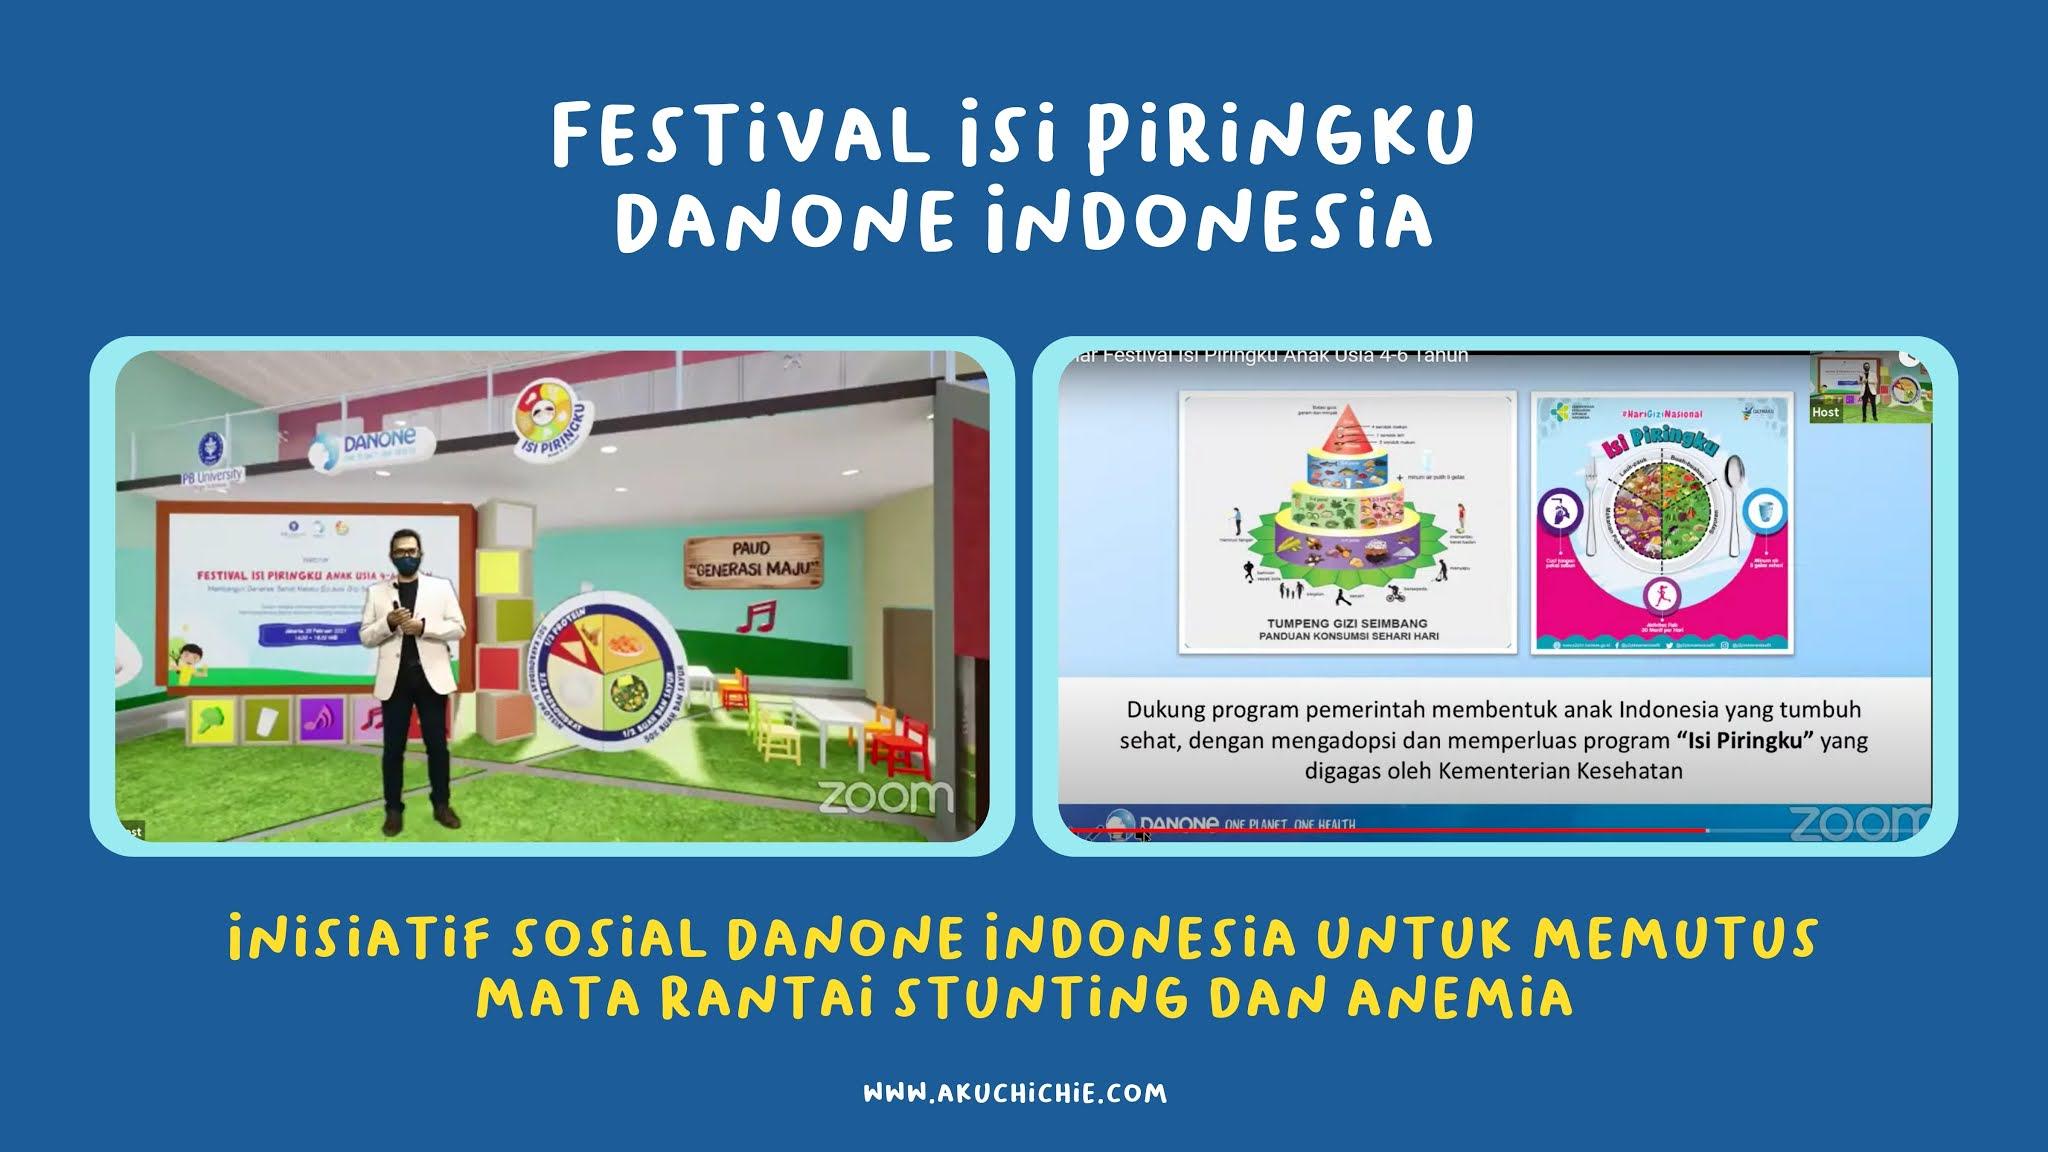 festival isi piringku danone indonesia